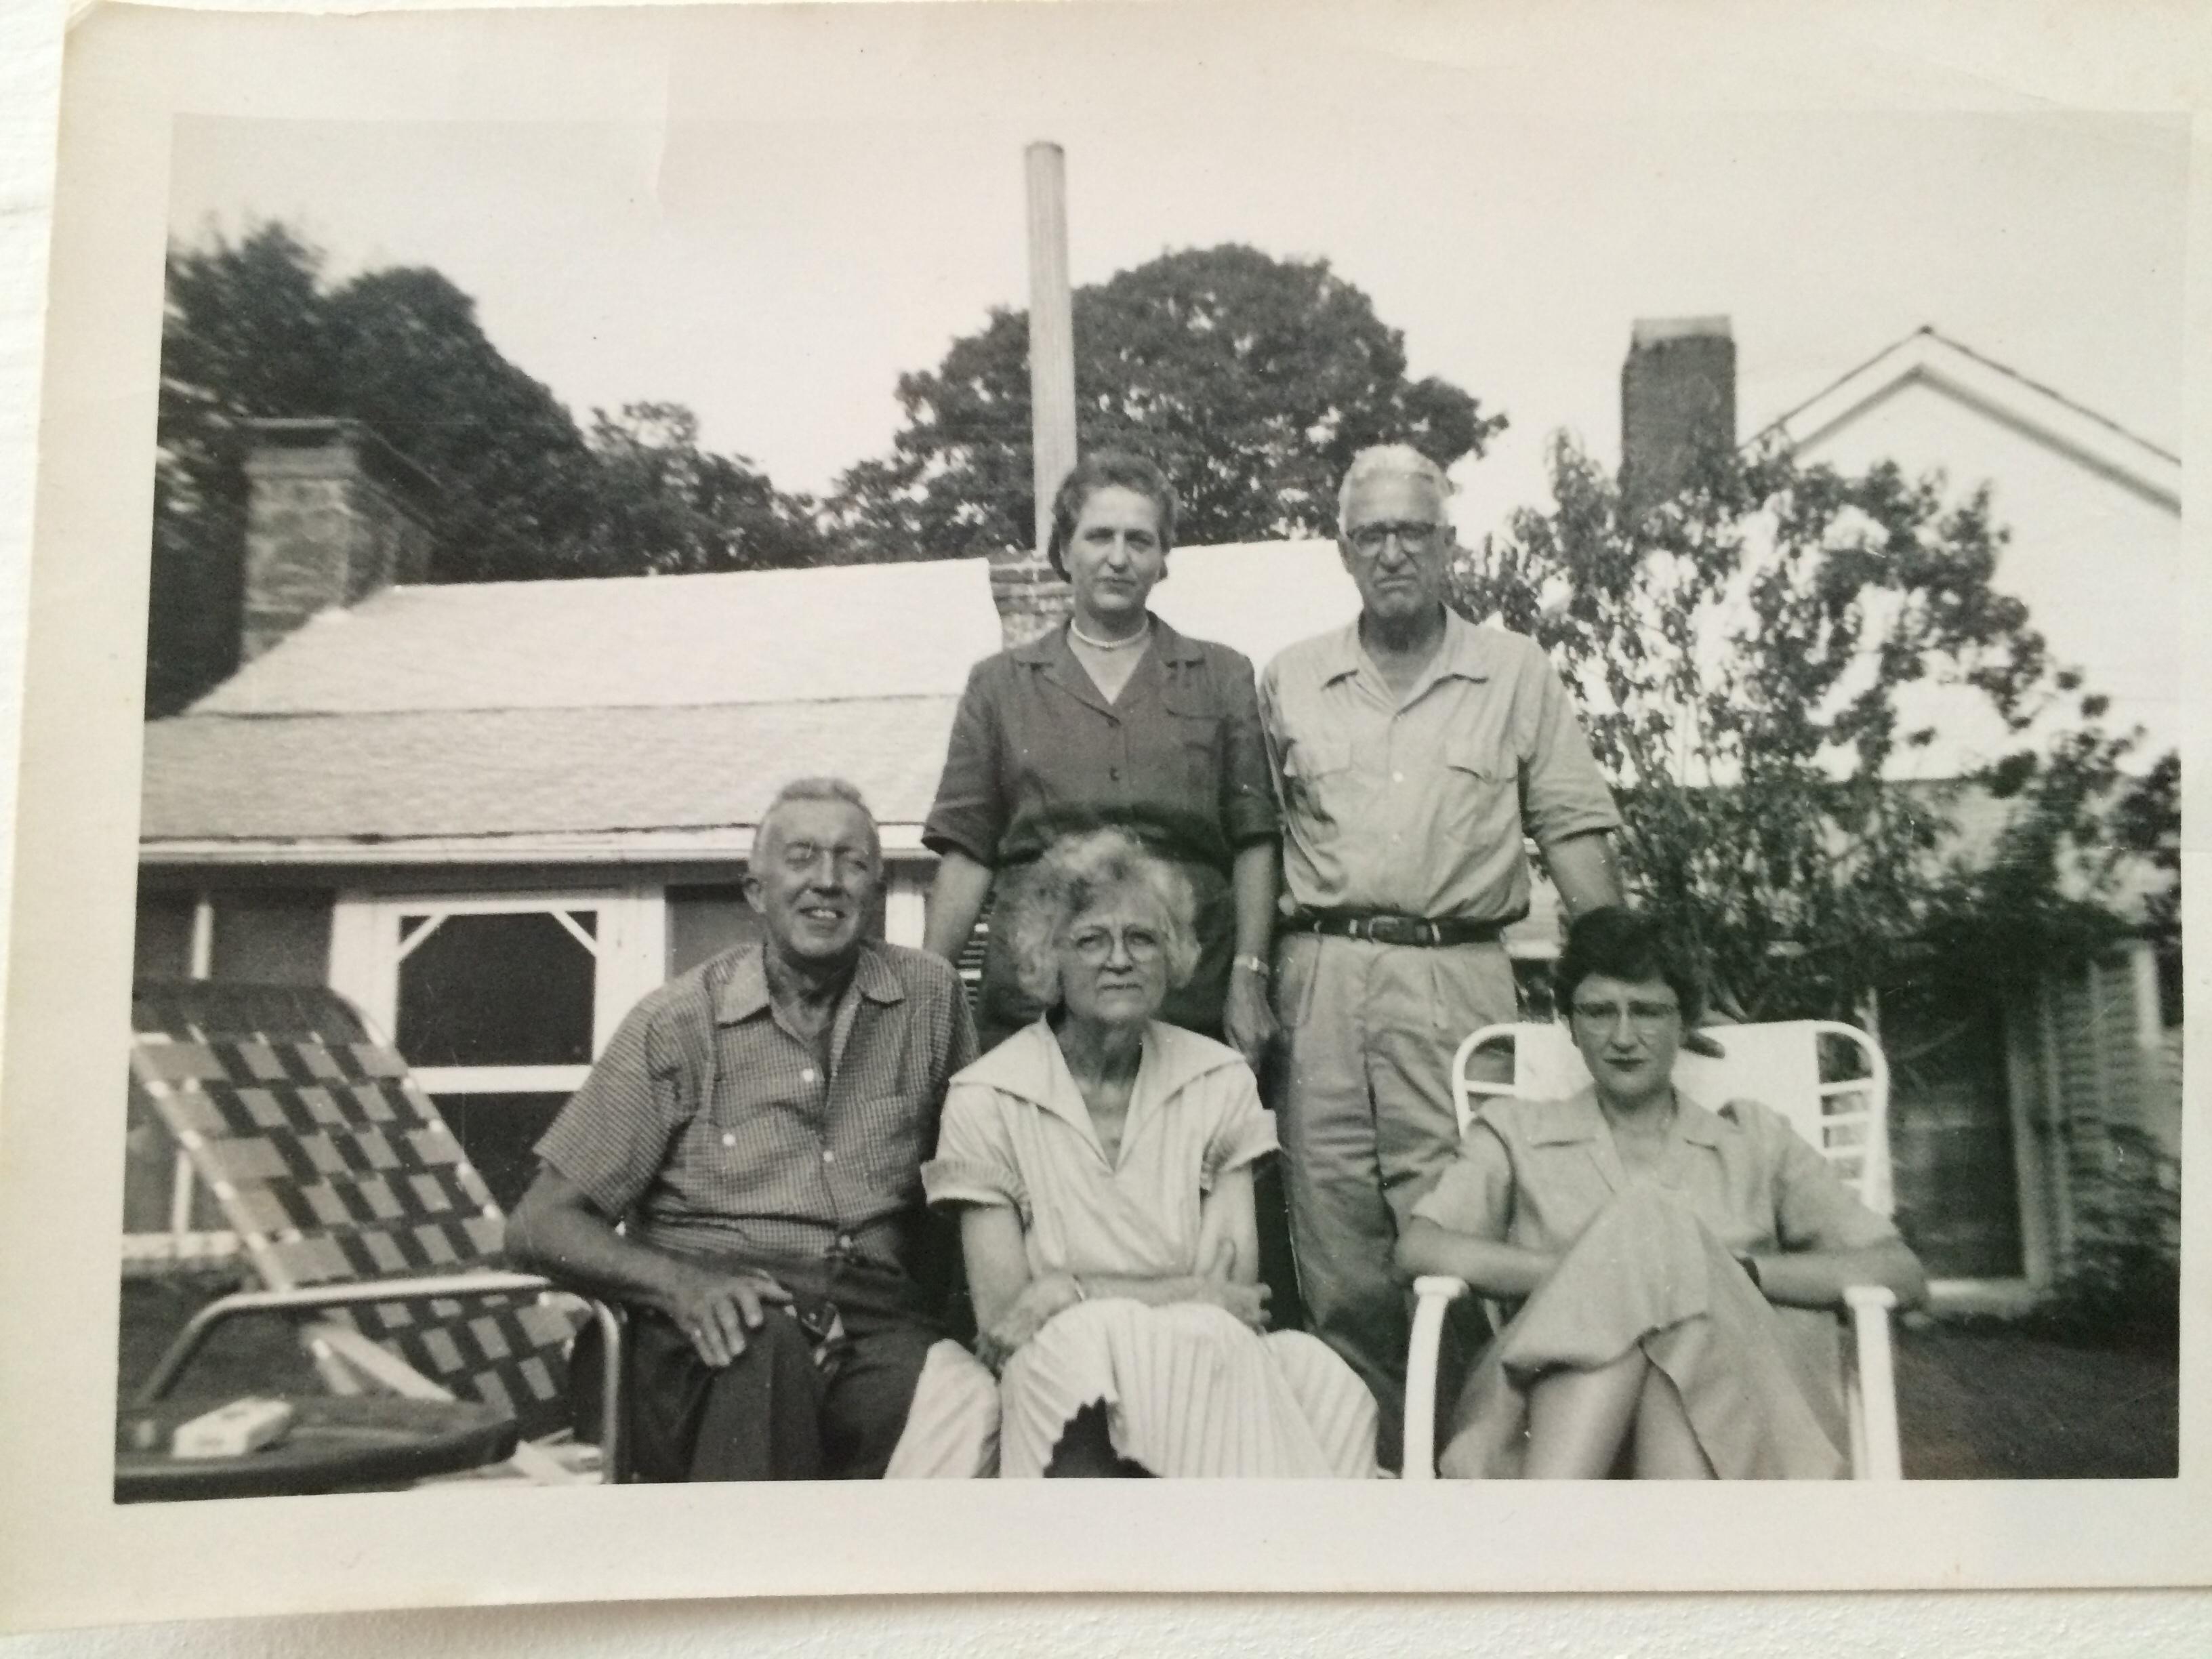 1940's farm life essay